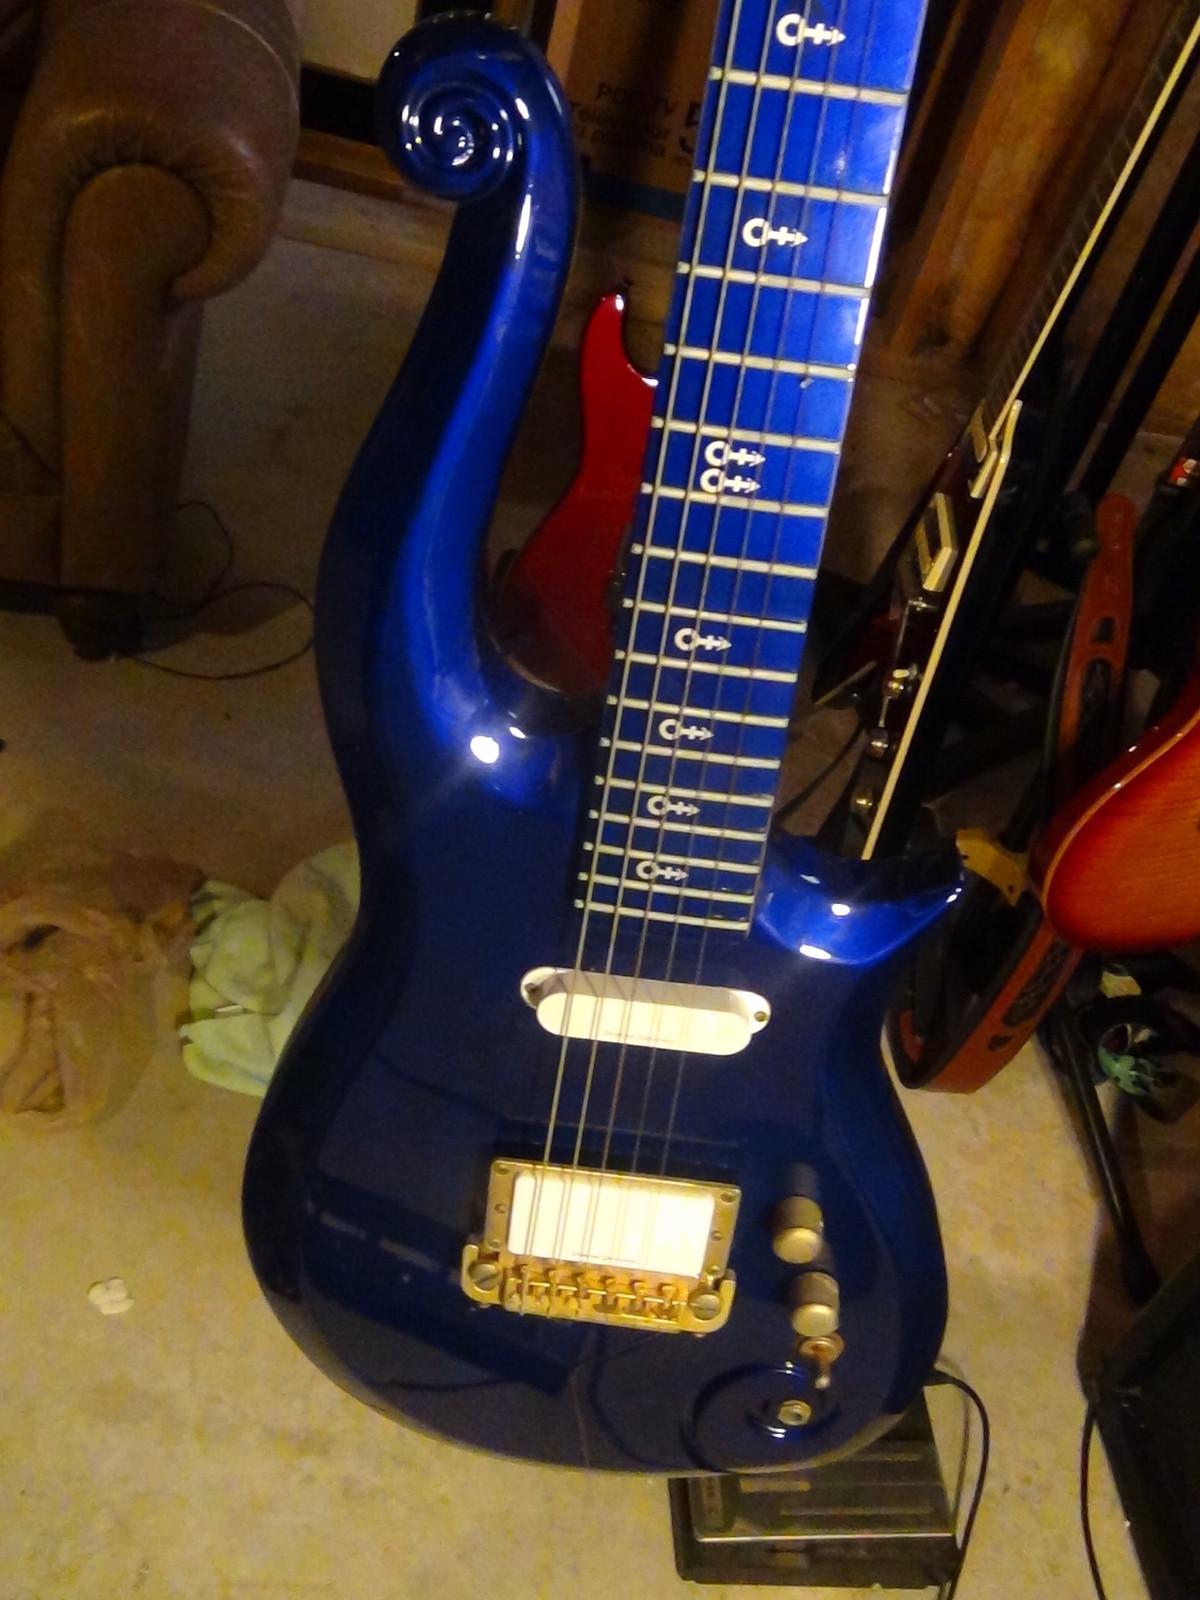 Cloud Guitar Central: Rave Blue schecter 4 Sale On ebay!